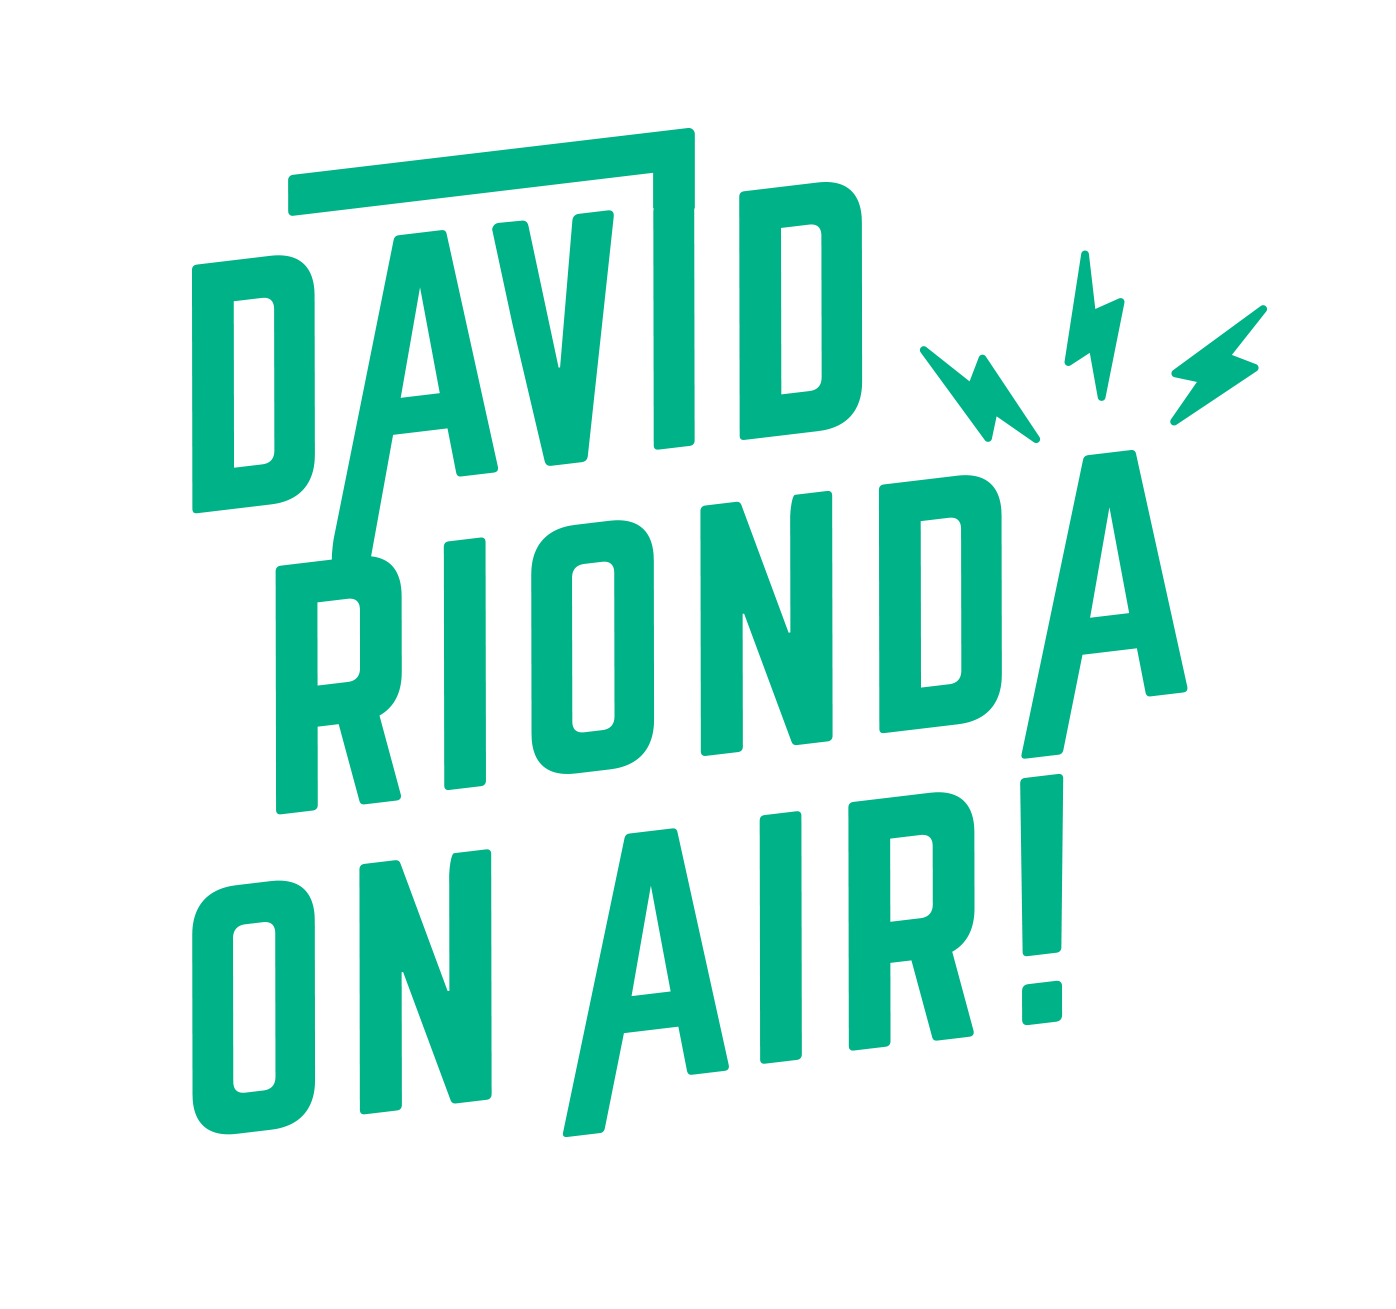 David Rionda